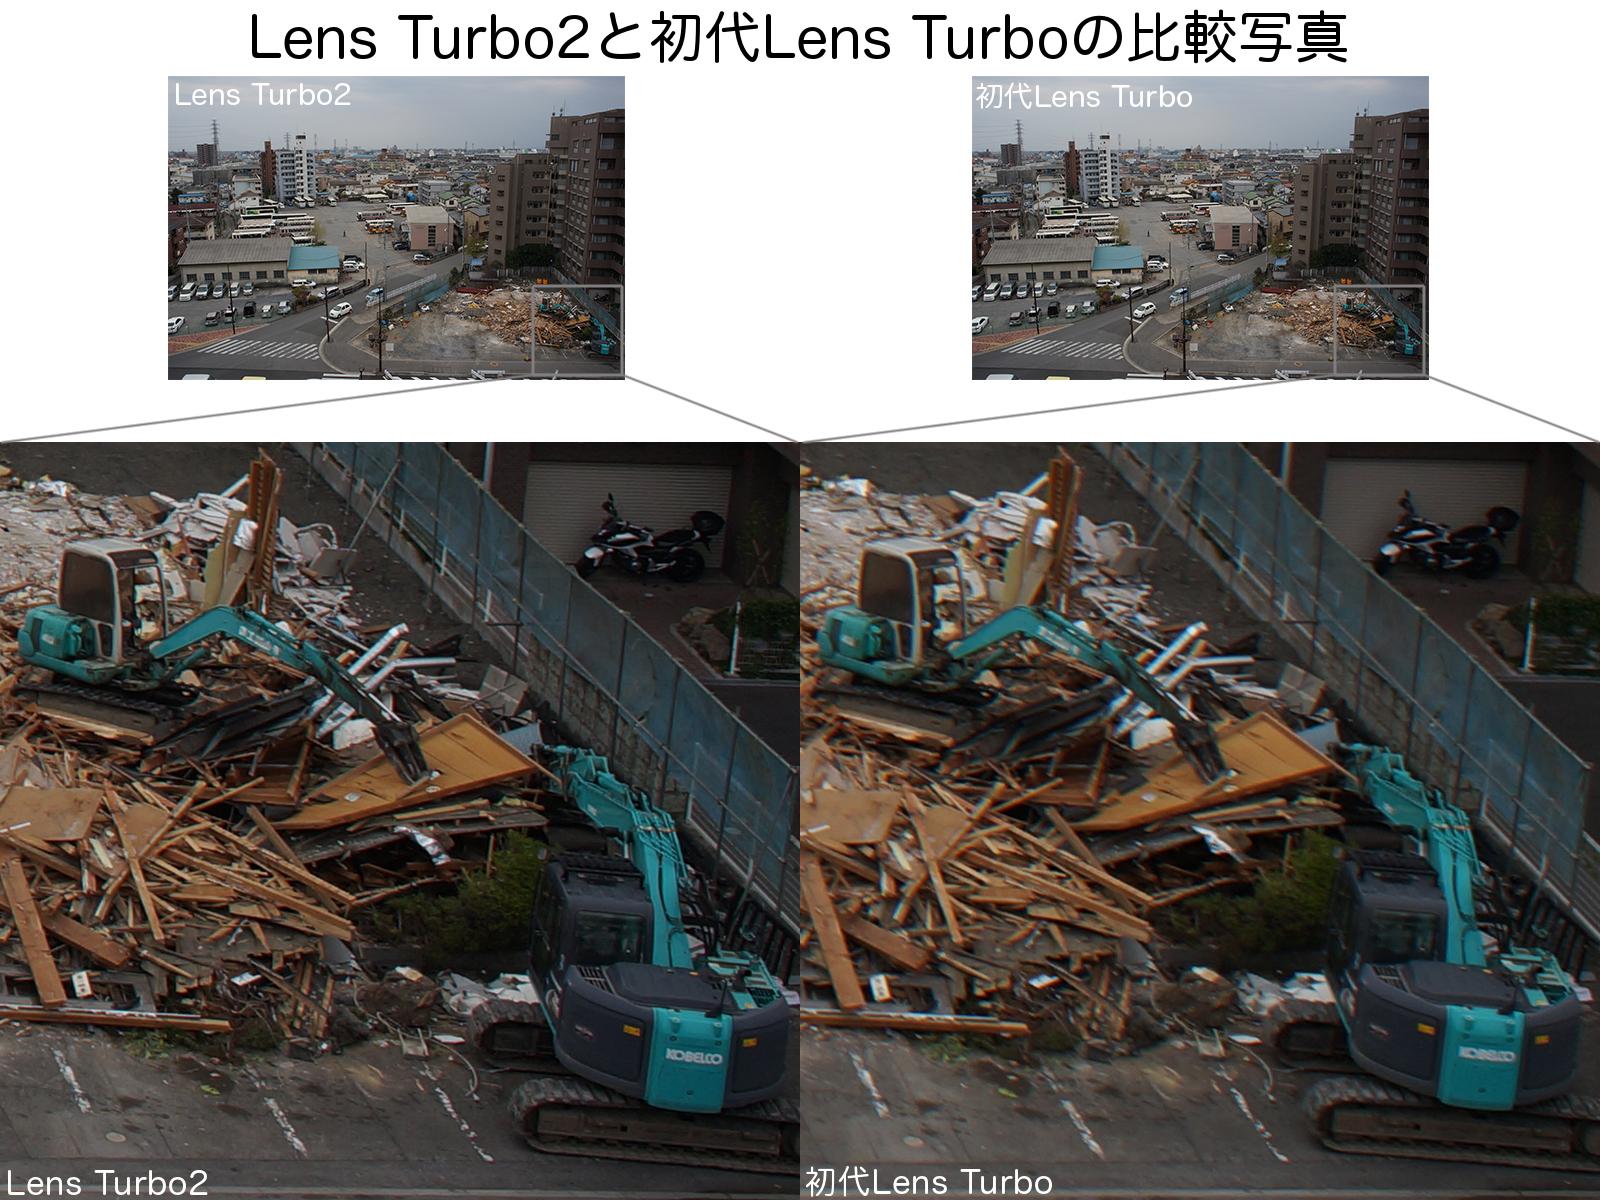 Middle Kazumitsu studies Lens Turbo2 M42 mount lens - Sony NEX/α.E マウントフォーカルレデューサーアダプター